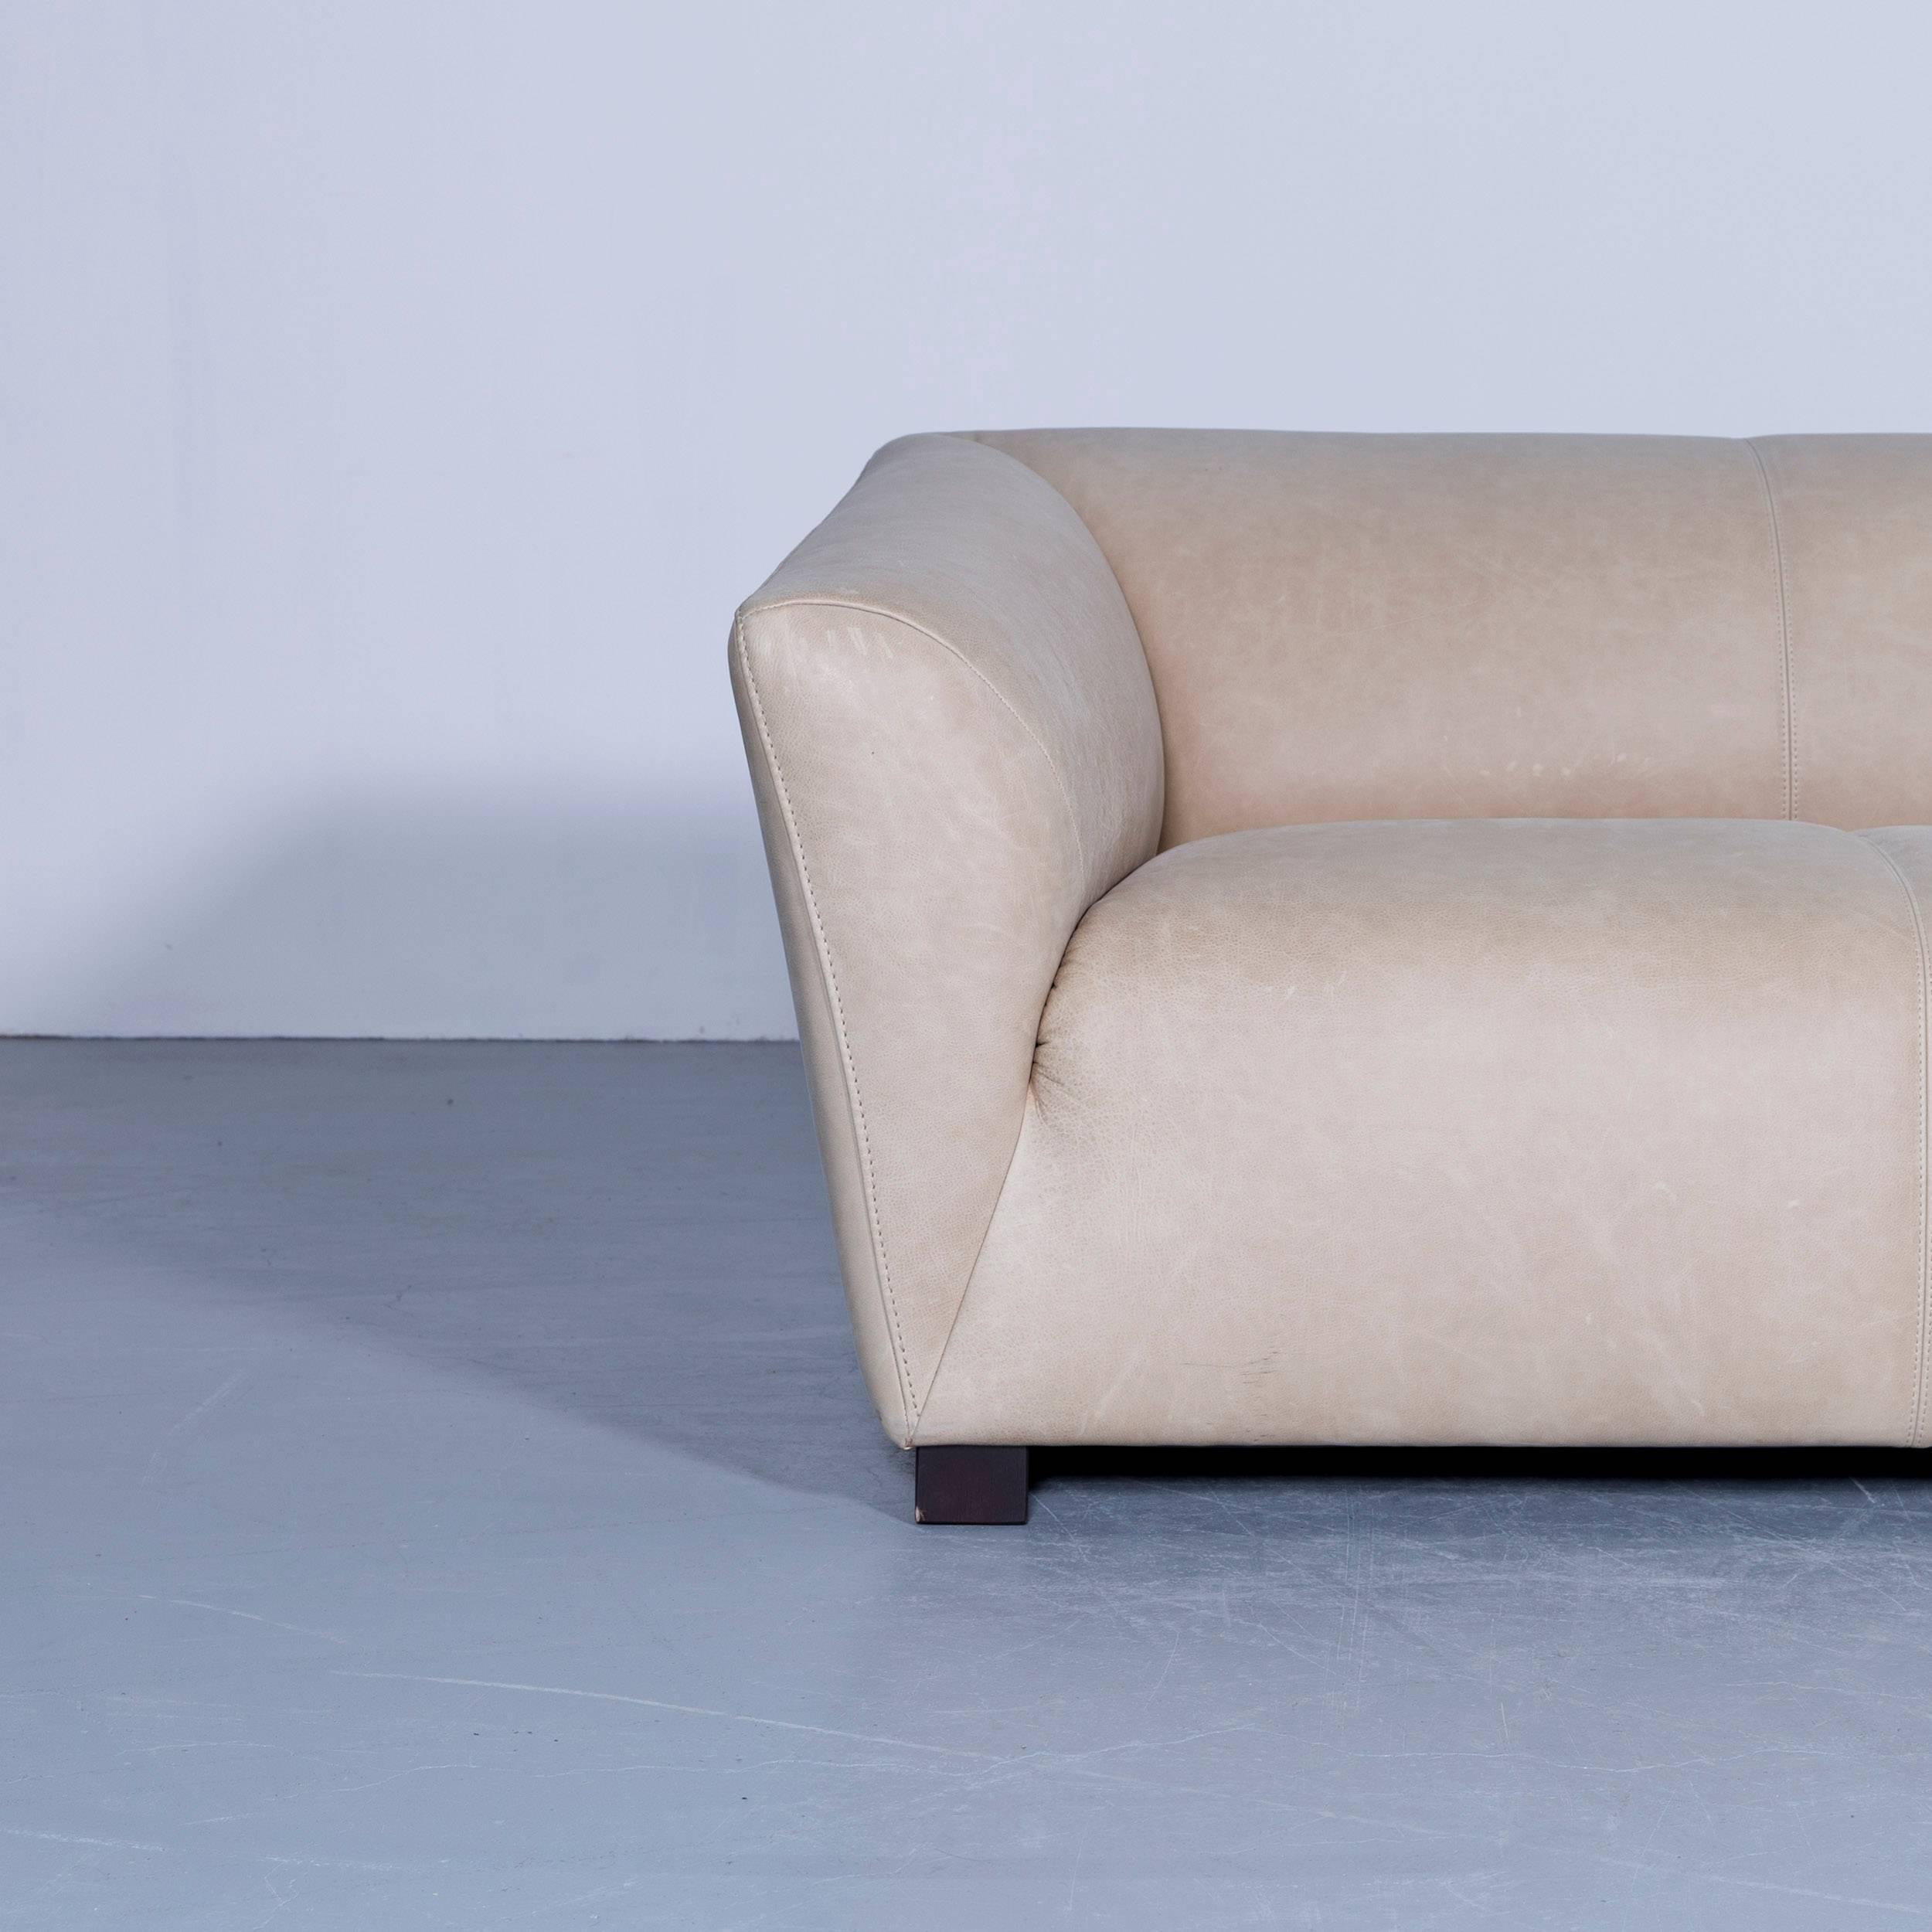 Beige Brown Colored Original Machalke Theo Designer Leather Sofa, In A  Minimalistic And Modern Design